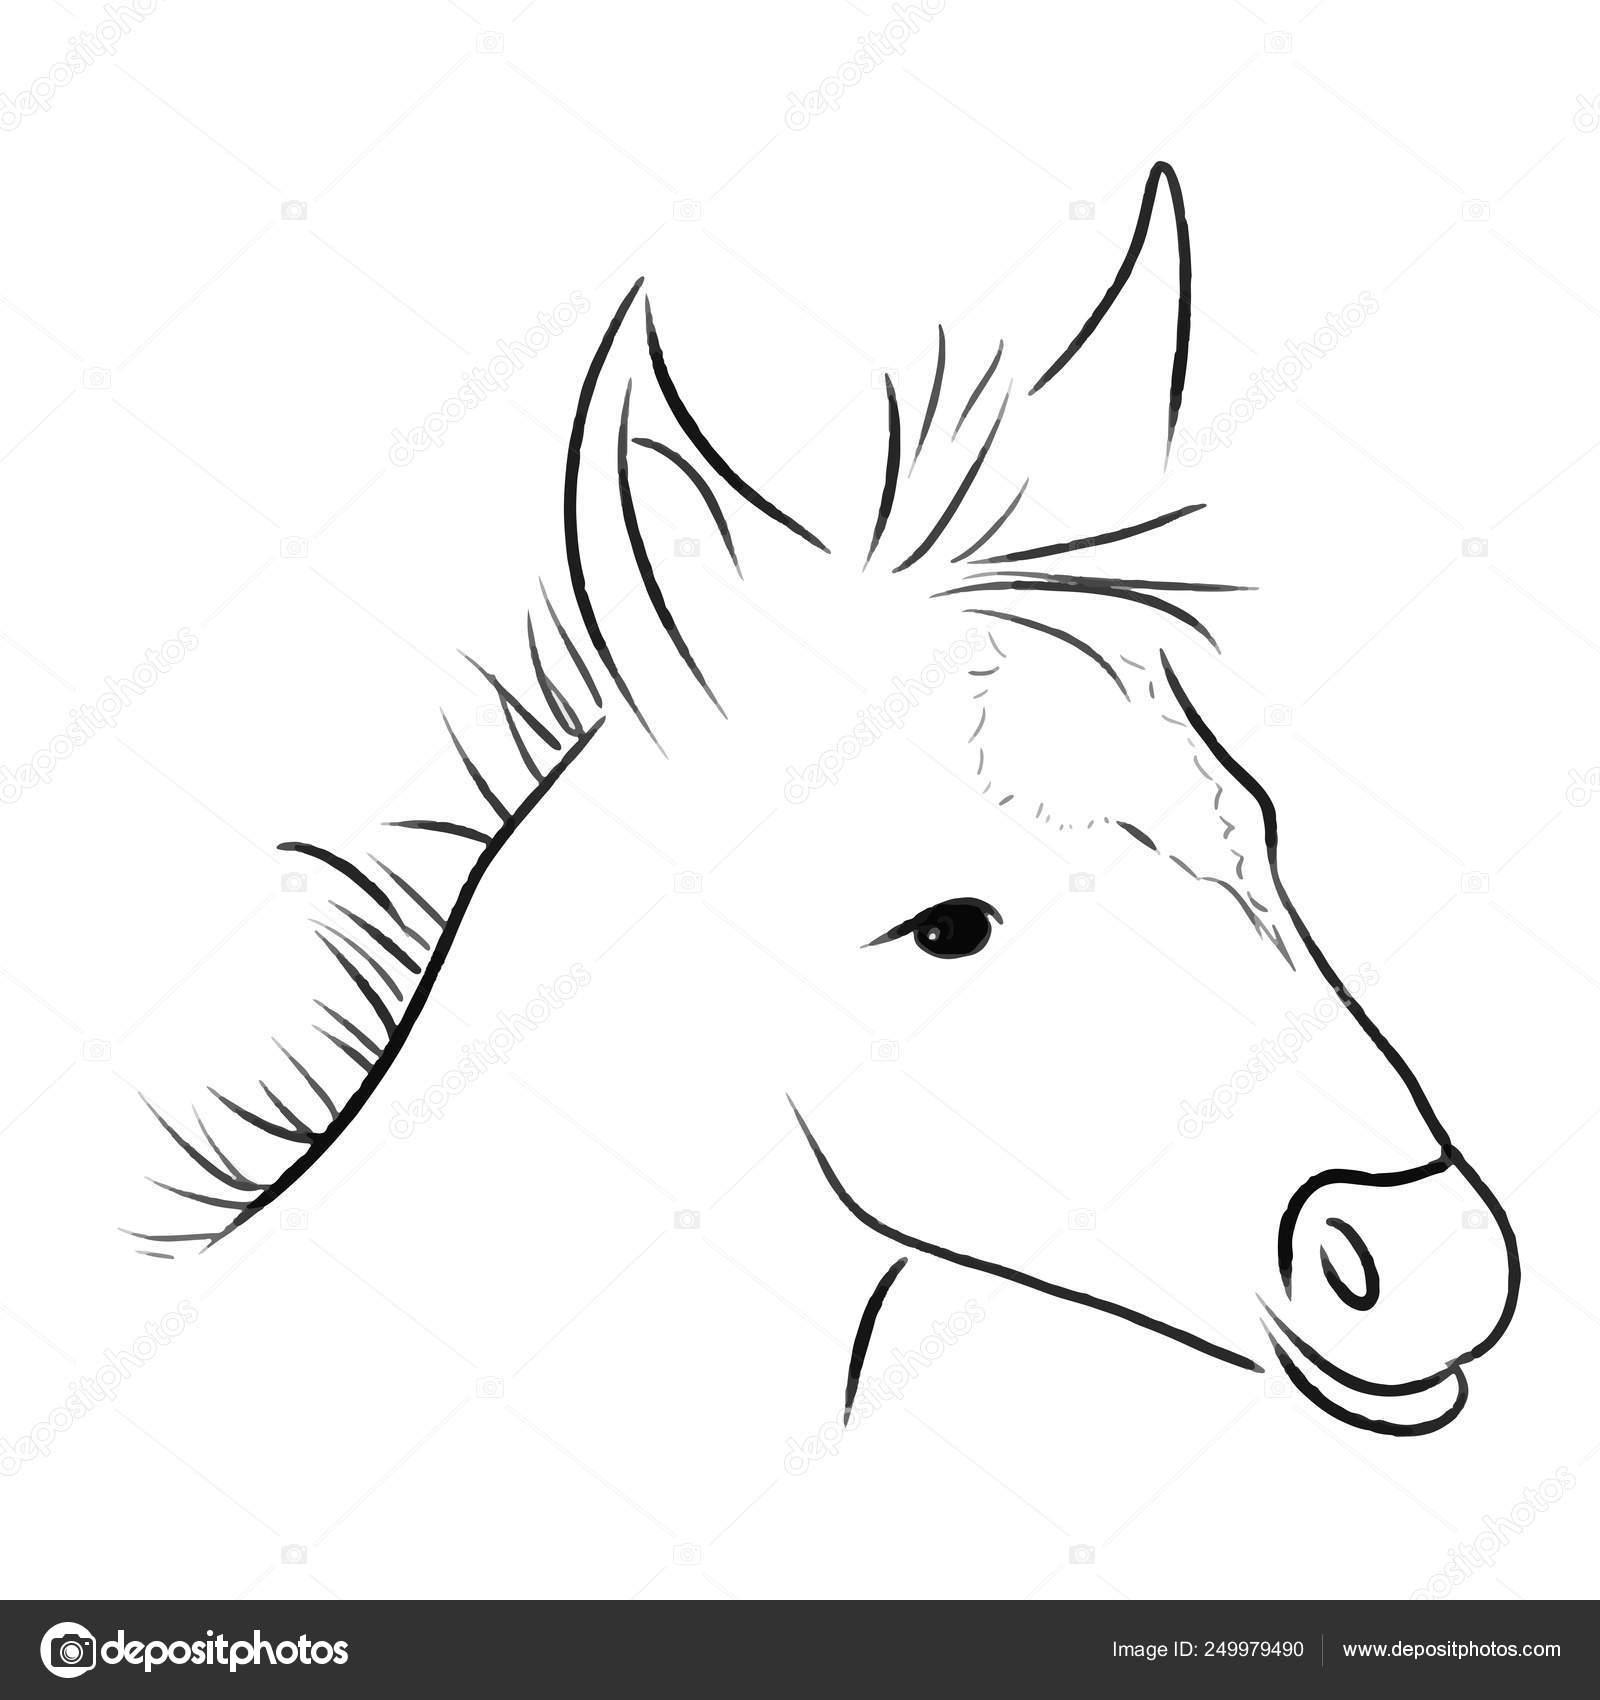 Horse Sketch One Line Draw Vector Illustration Stock Vector C Krasnenkon Gmail Com 249979490